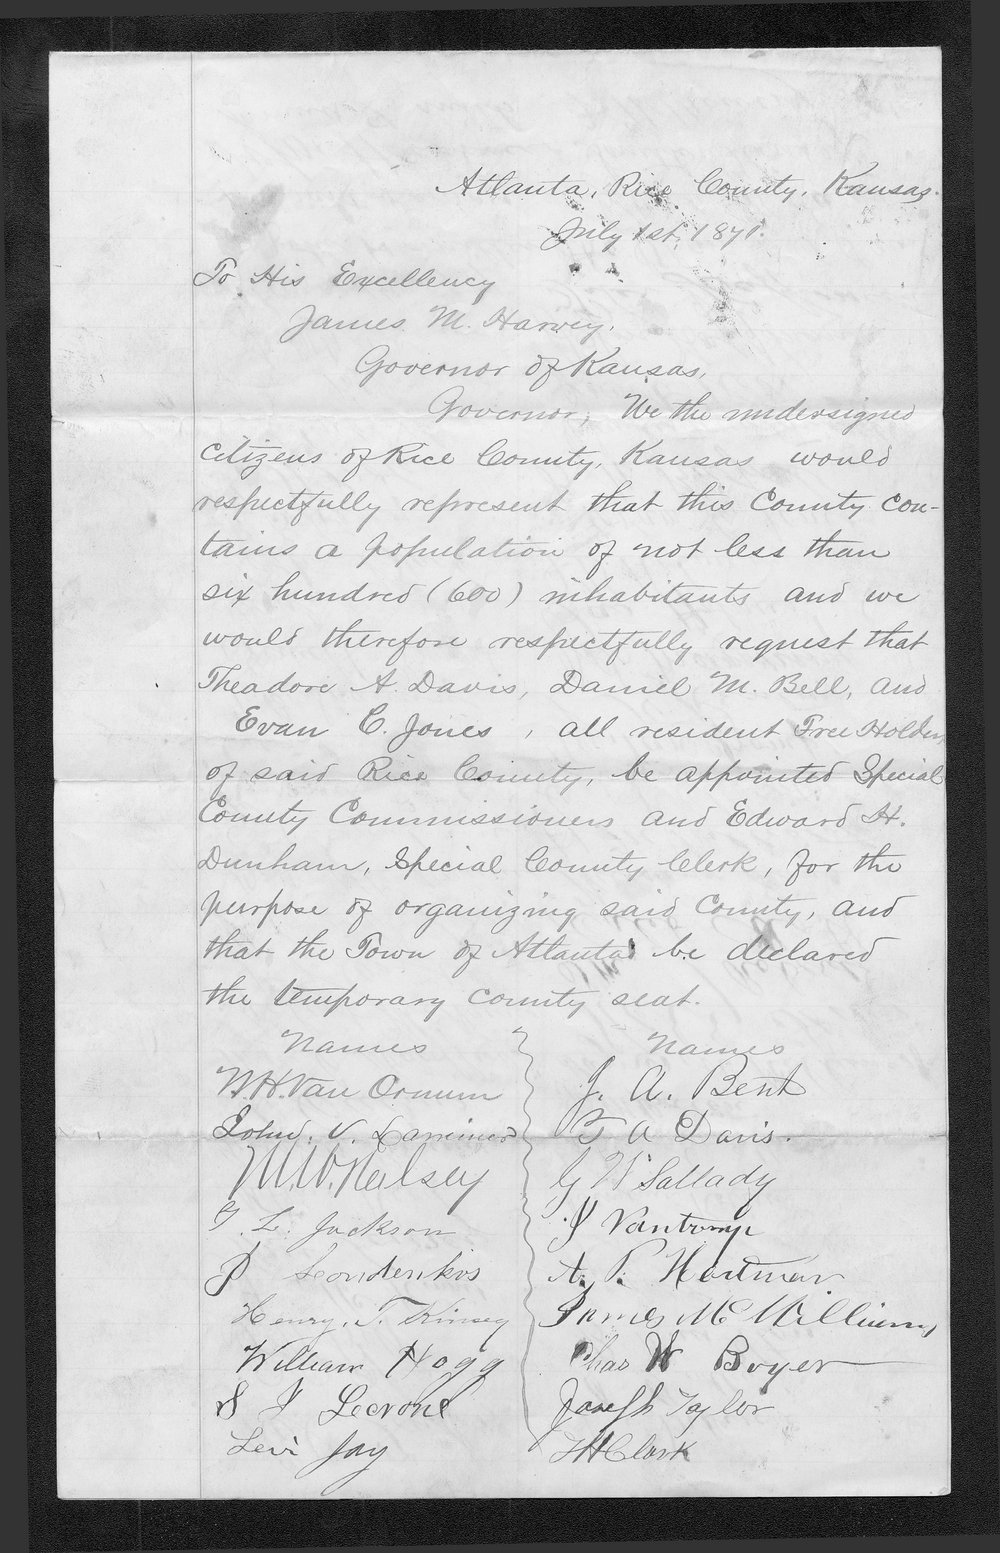 Rice County organization files - 3